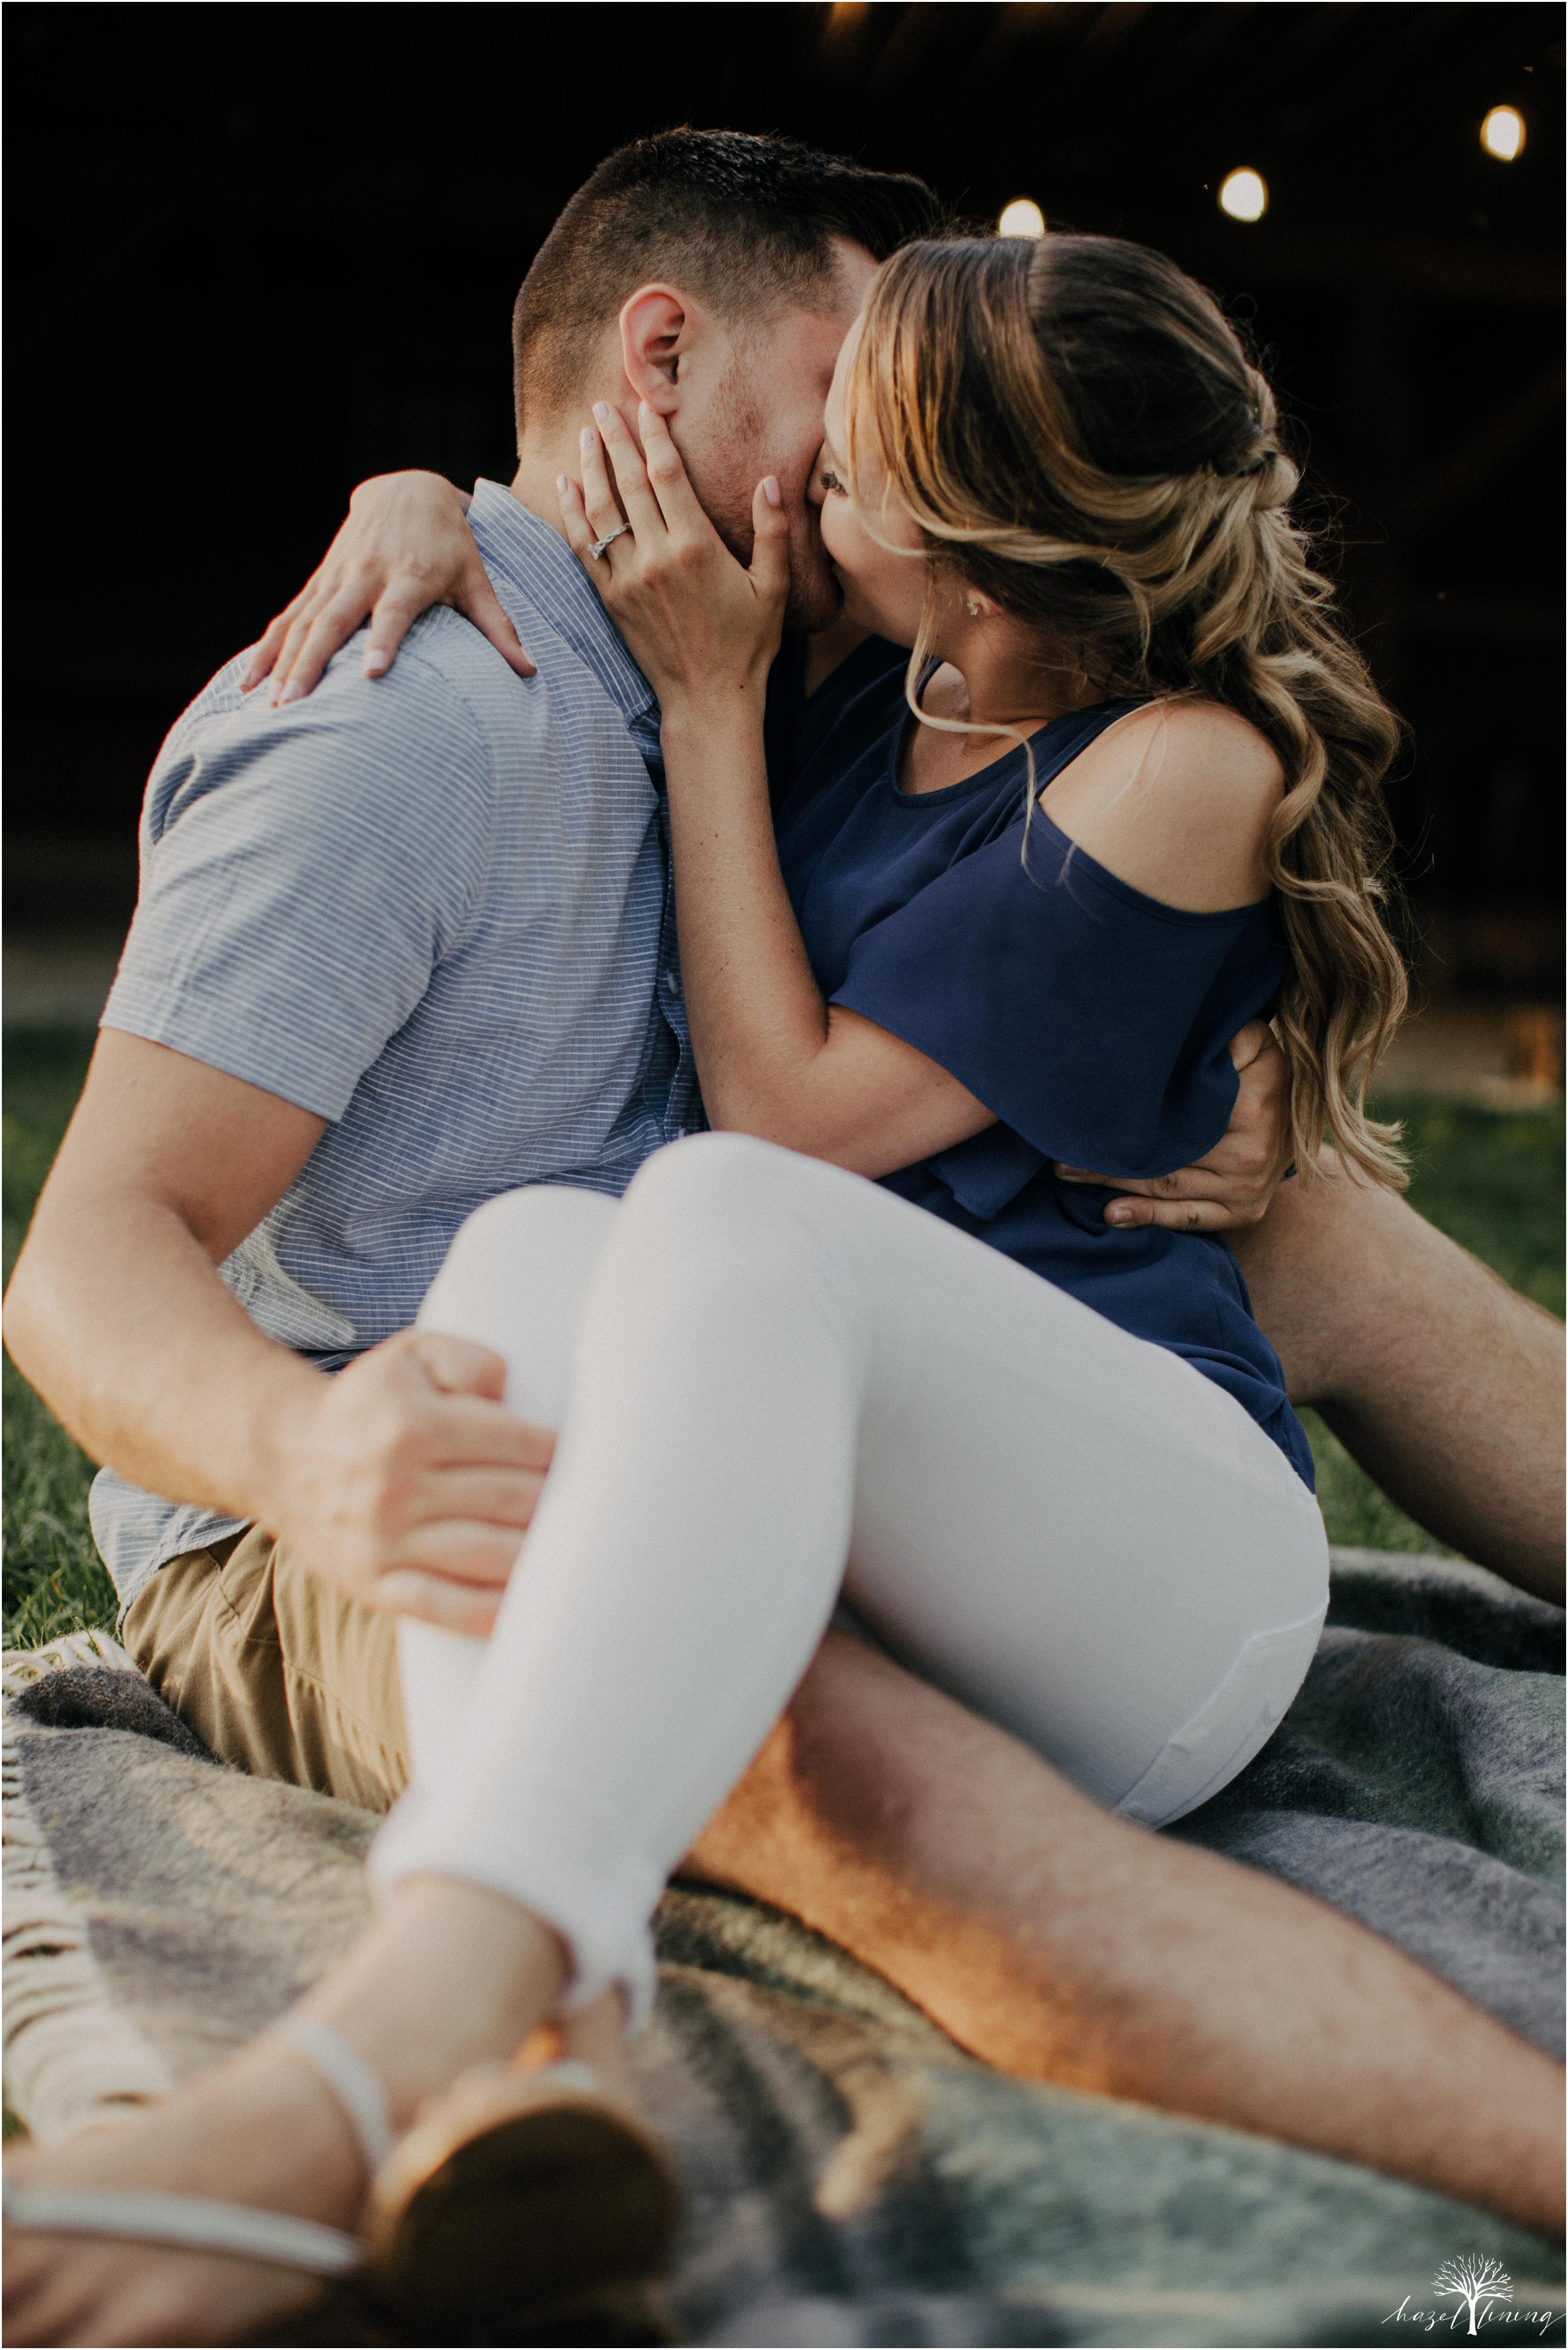 rachel-warner-chris-niedrist-the-farm-bakery-and-events-quakertown-pa-summer-engagement-hazel-lining-photography-destination-elopement-wedding-engagement-photography_0065.jpg